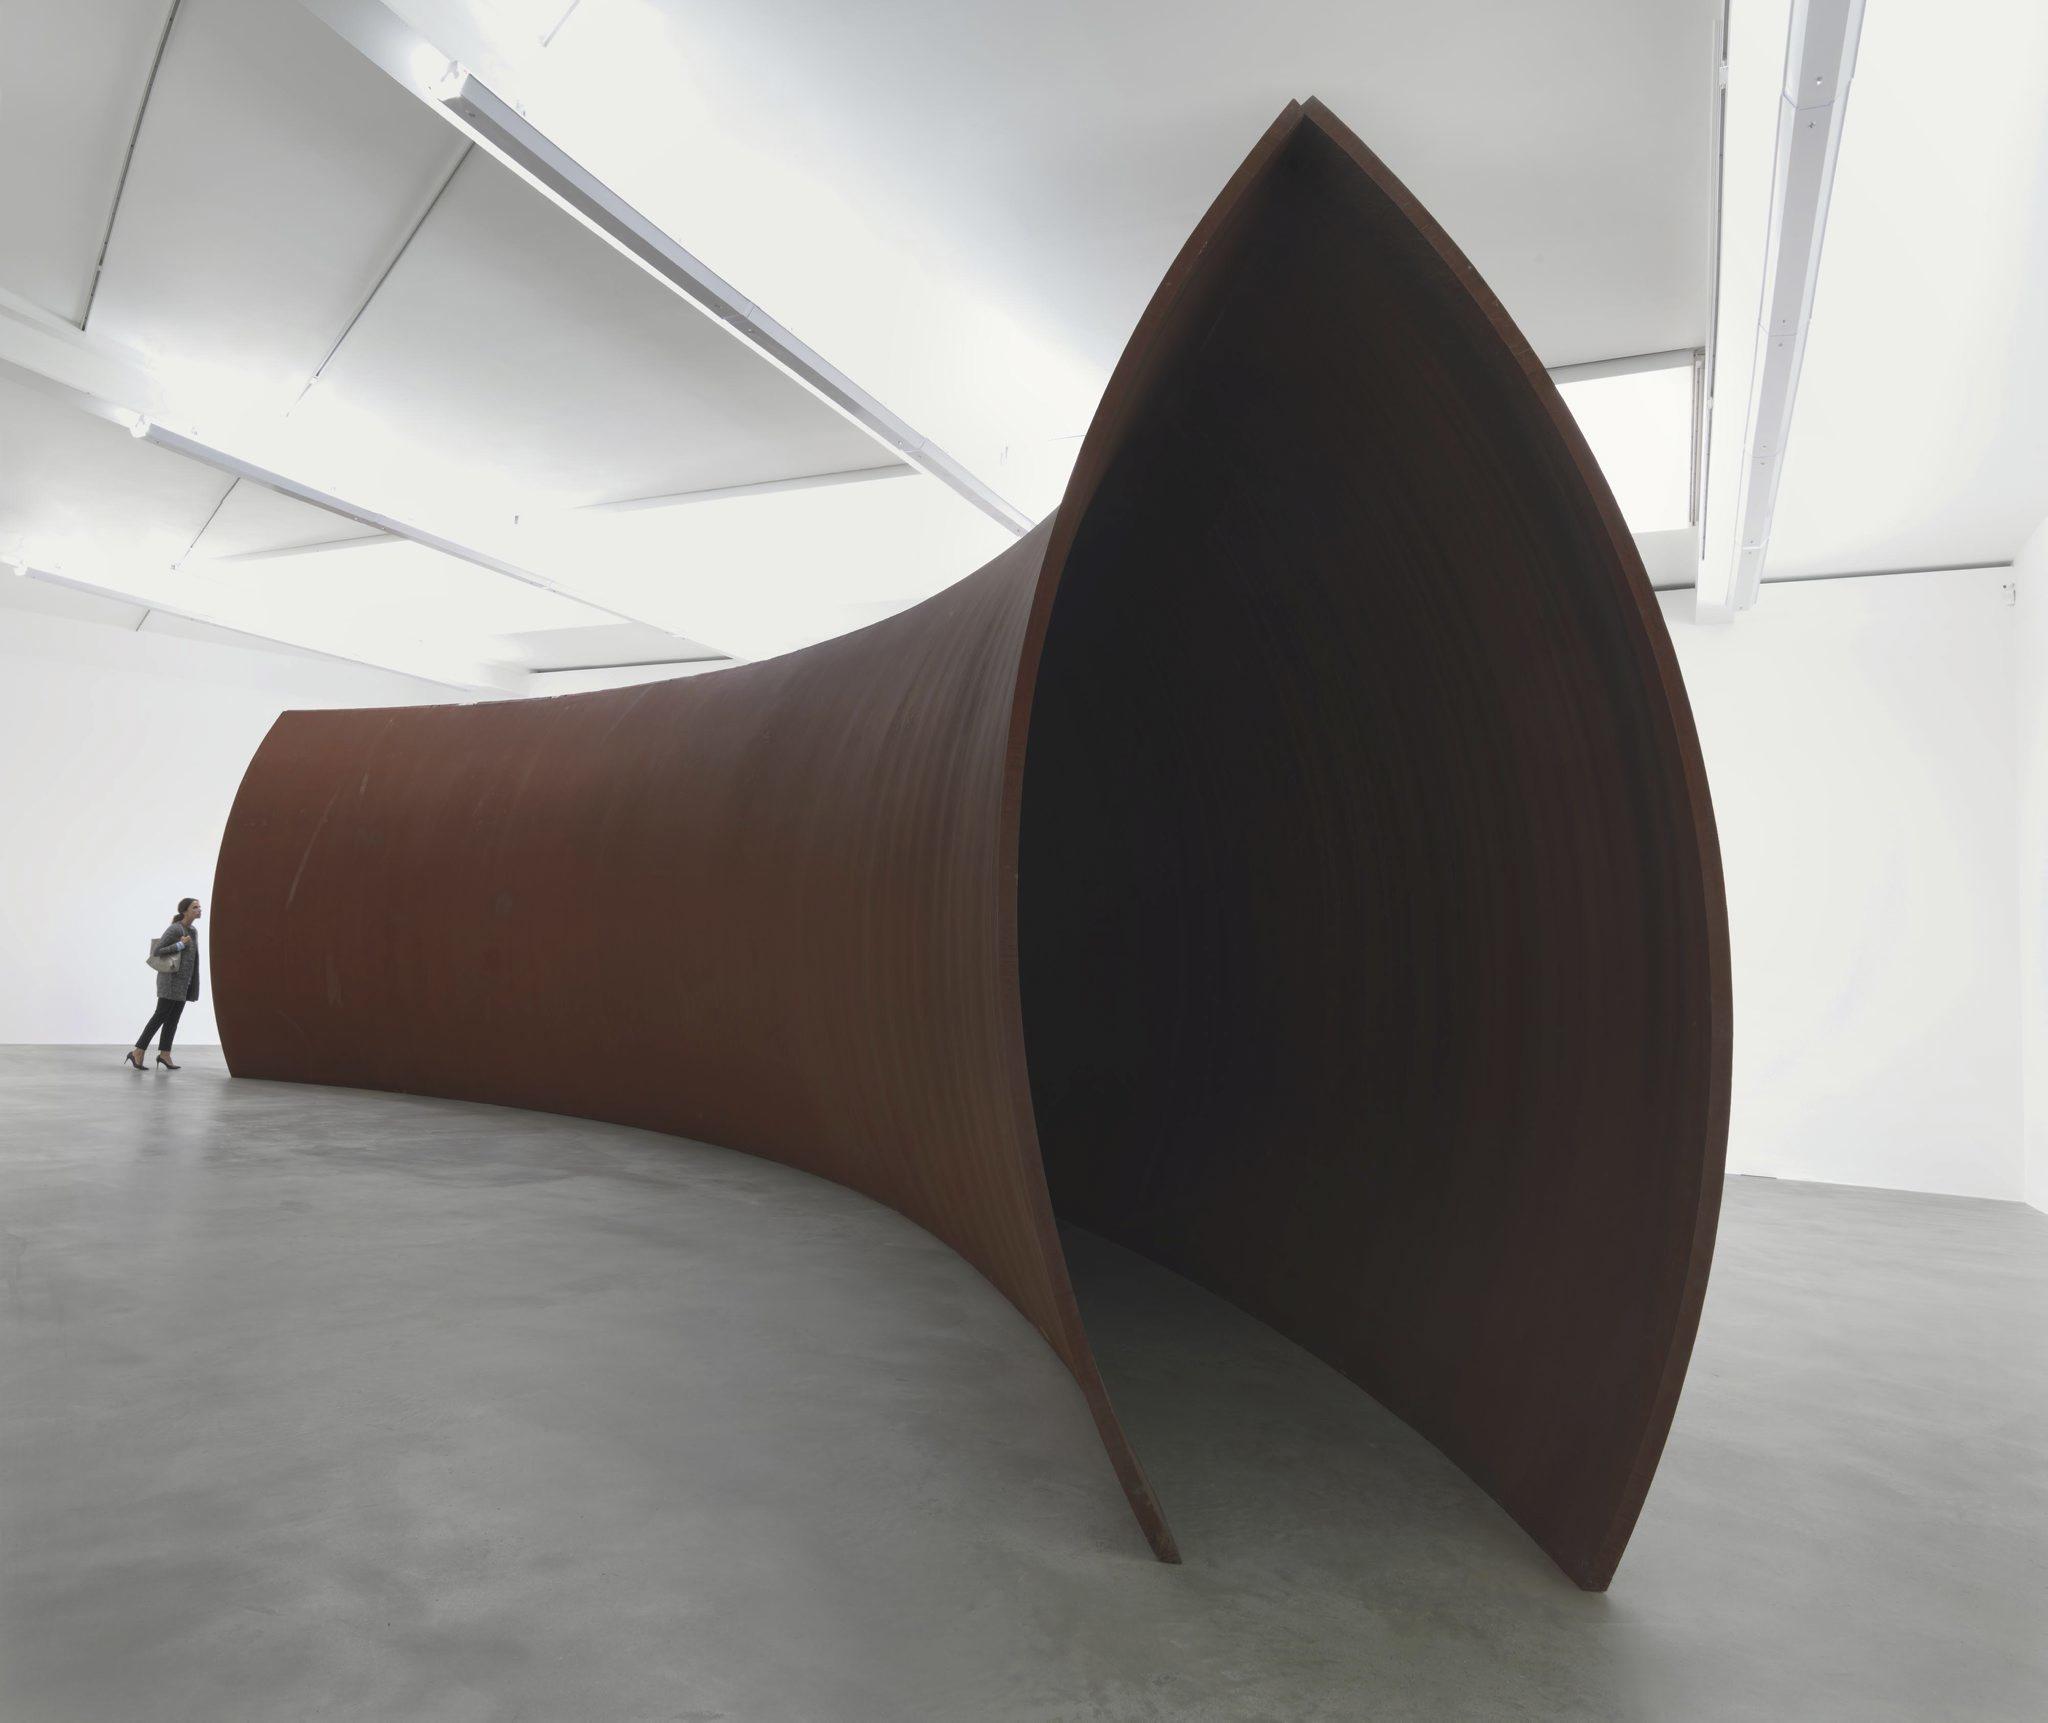 Modern Minimalist Artist Richard Serra Art In London